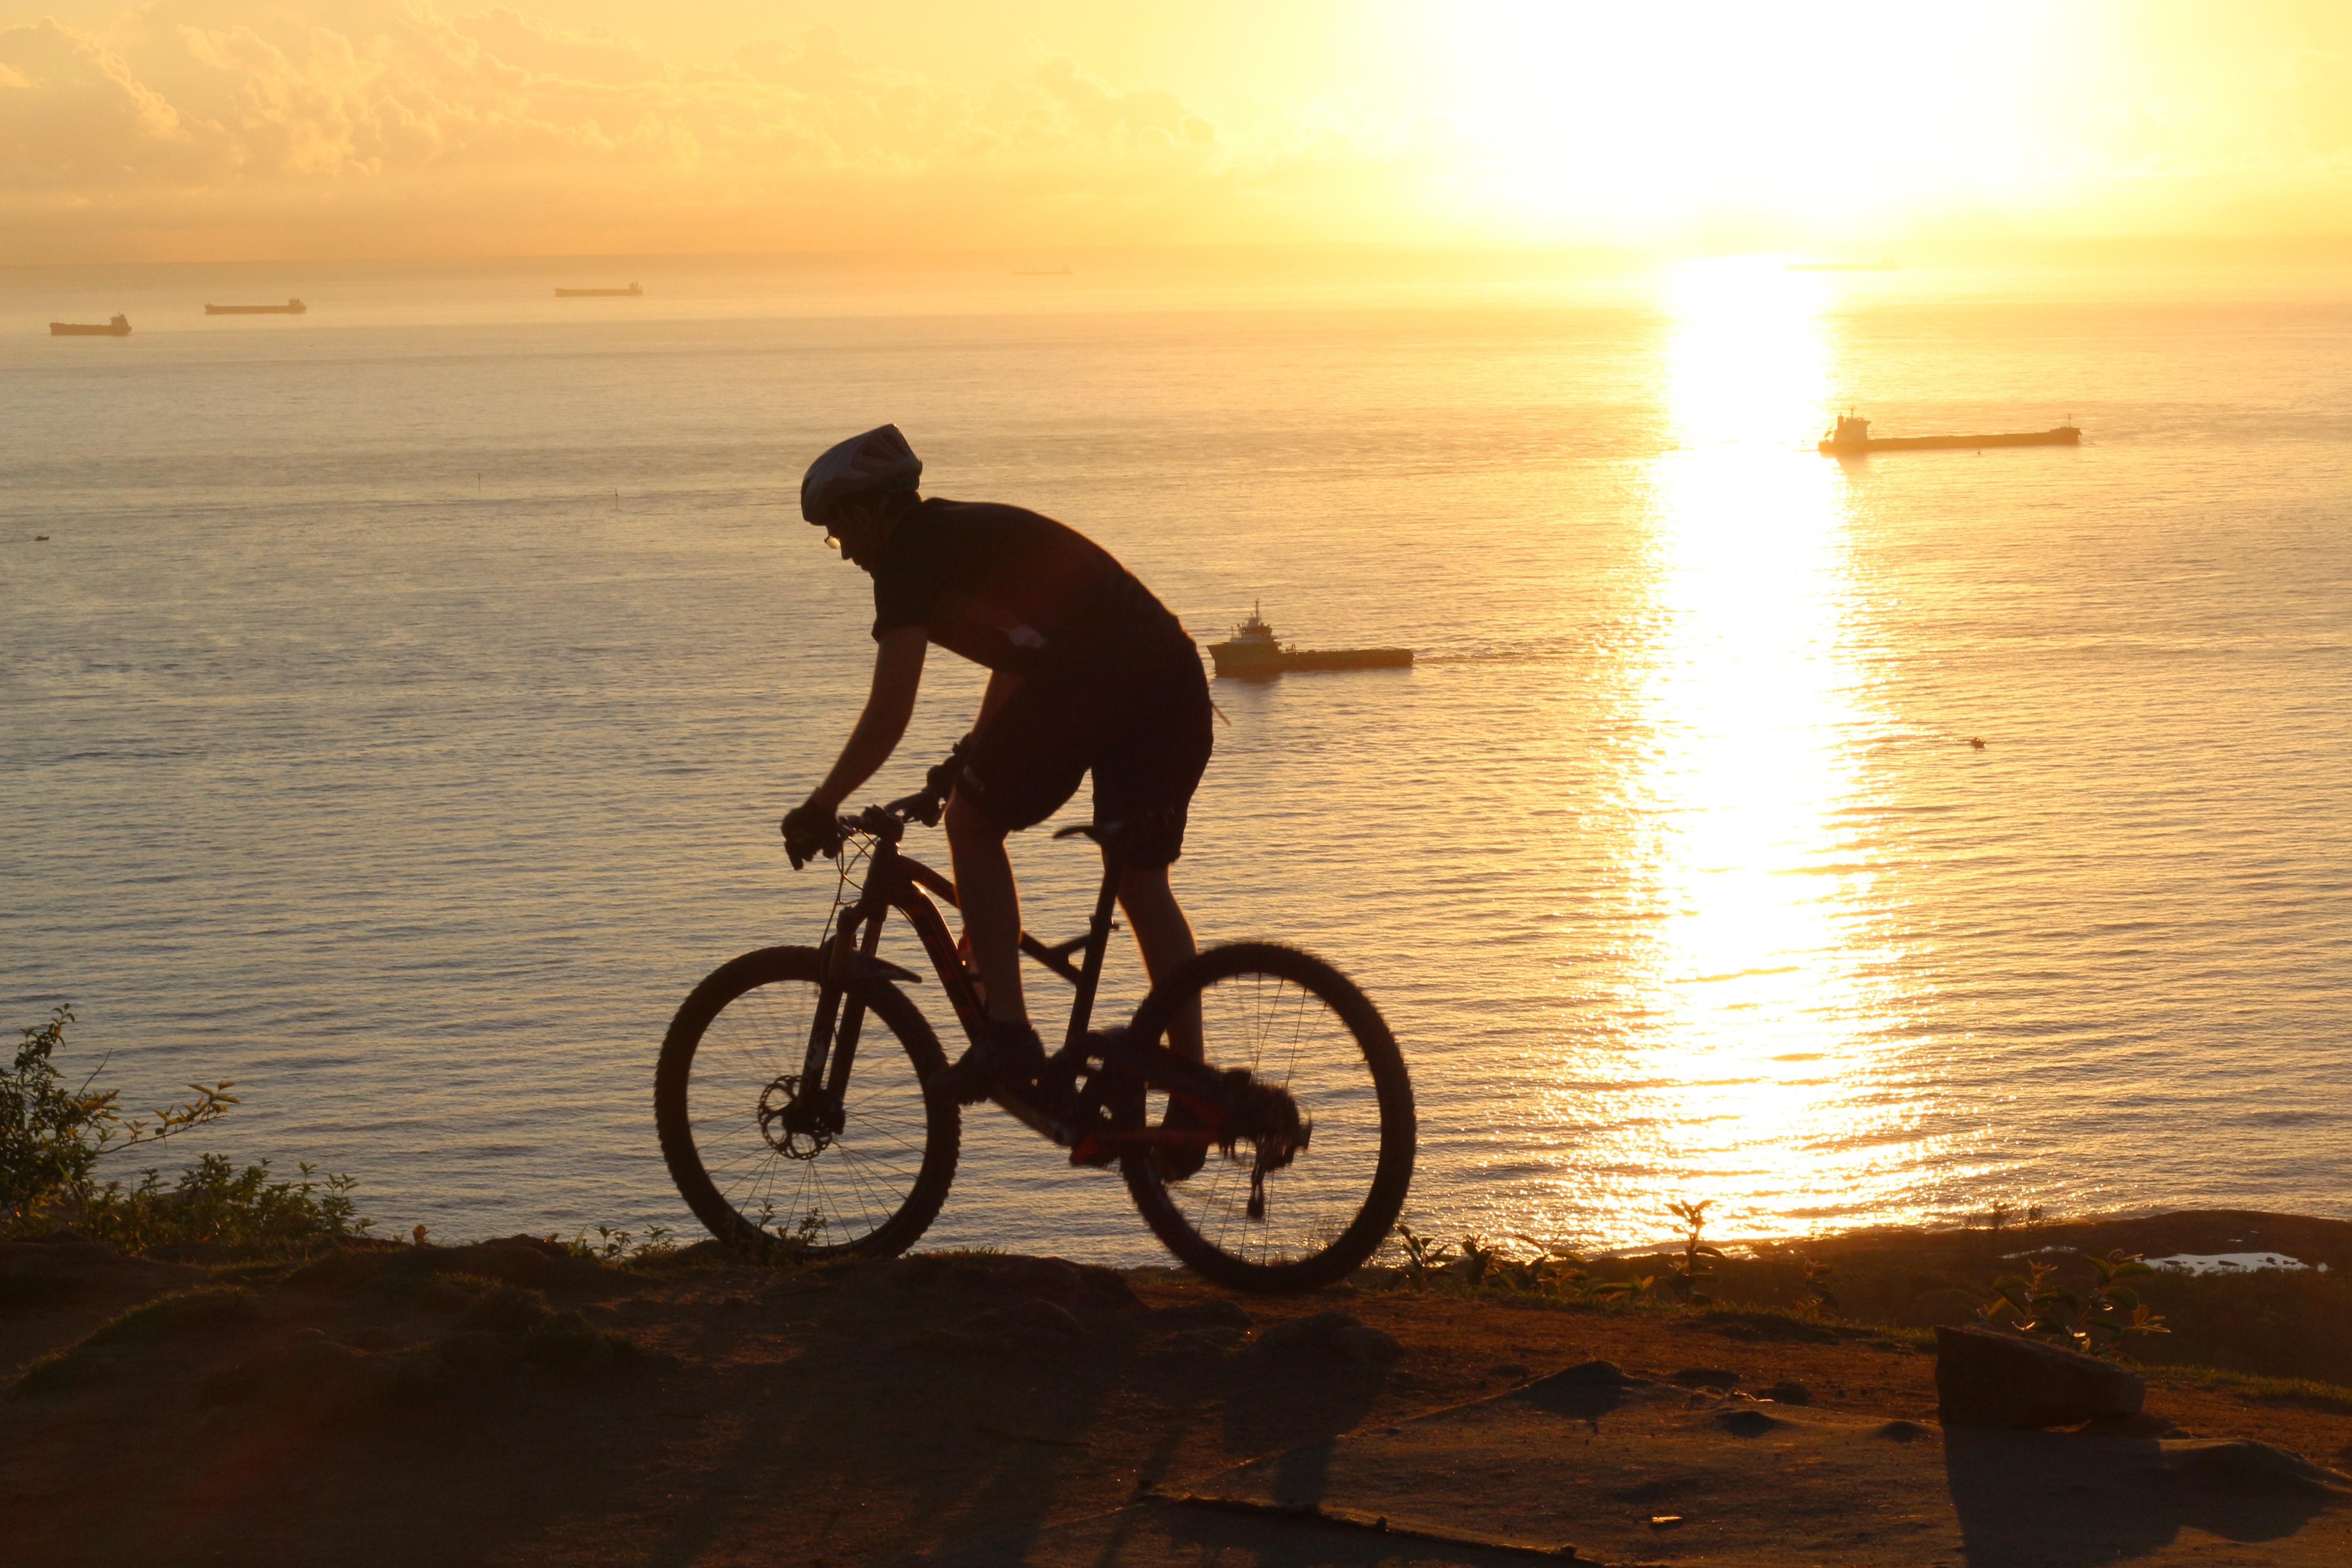 Bike Equipment Evening Sport Sunrise Enduro Pxhere Mtb Cycling Mountain Bicycle Beach Free Morning Sports 600618 Pilot Photos Images Sea Stock Vehicle Sunset - Sol Ride Mar Allmountain 5184x3456